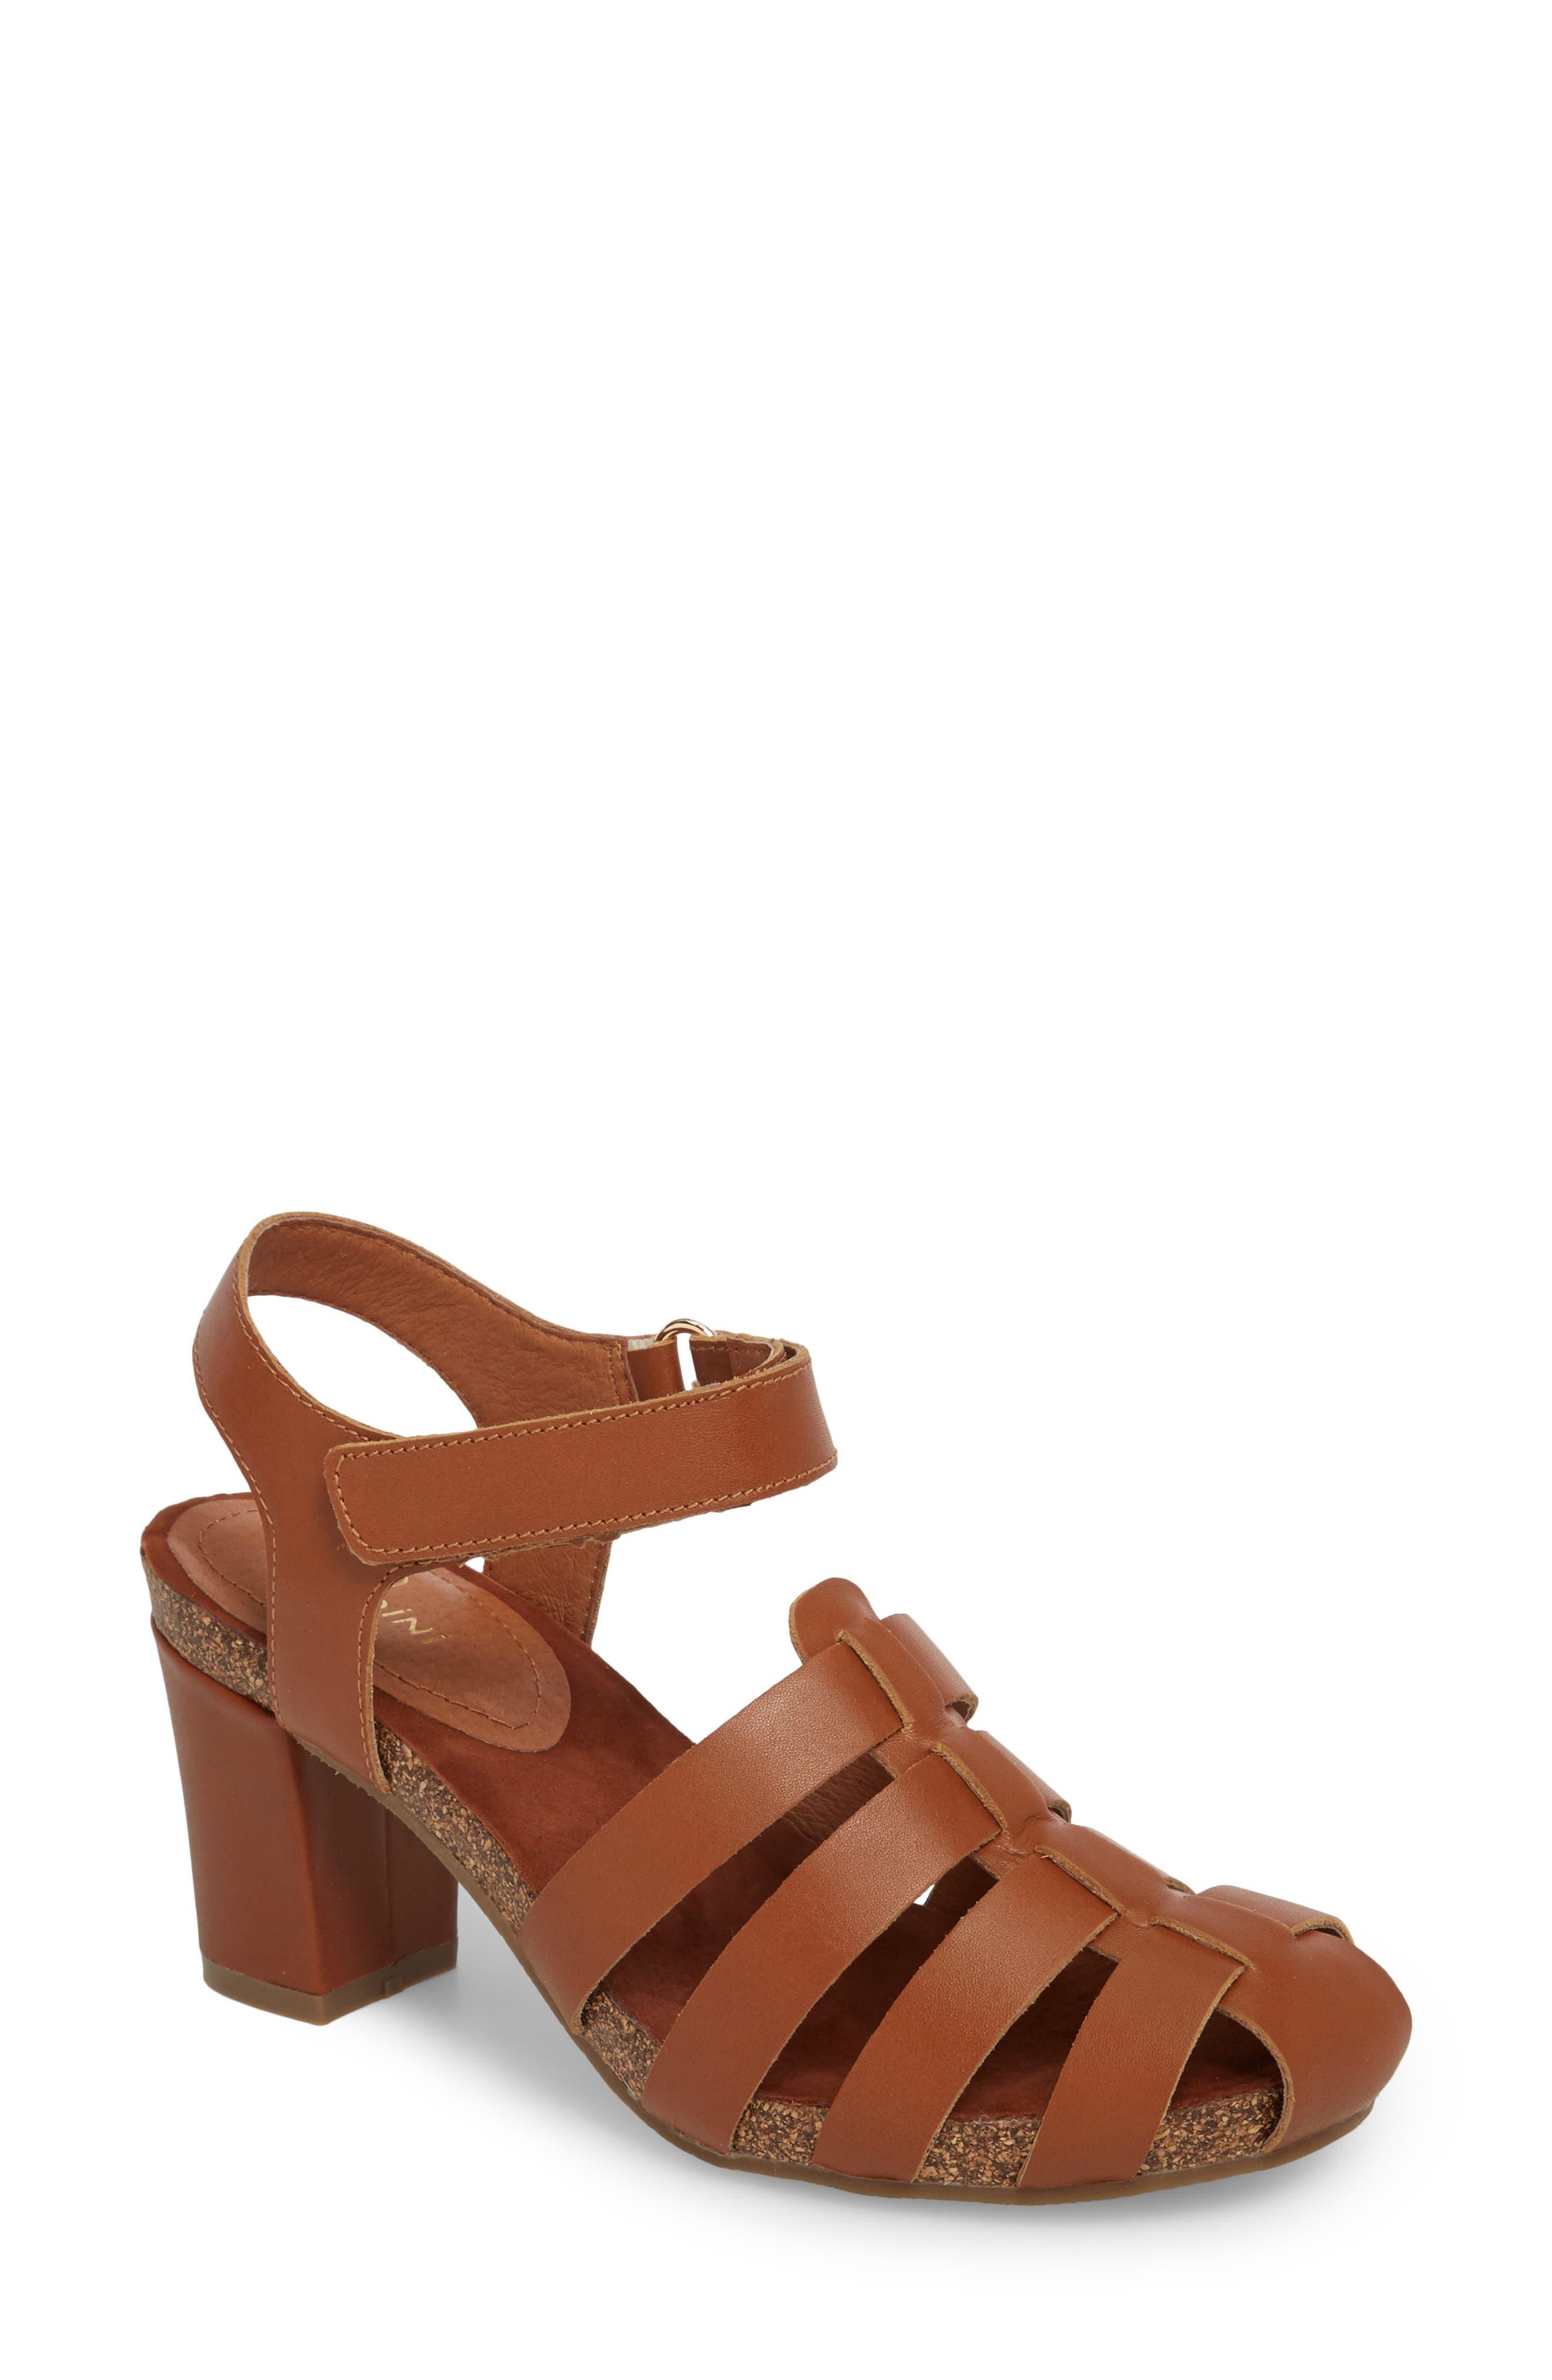 Carrara Block Heel Sandal,                             Main thumbnail 1, color,                             Cognac Leather